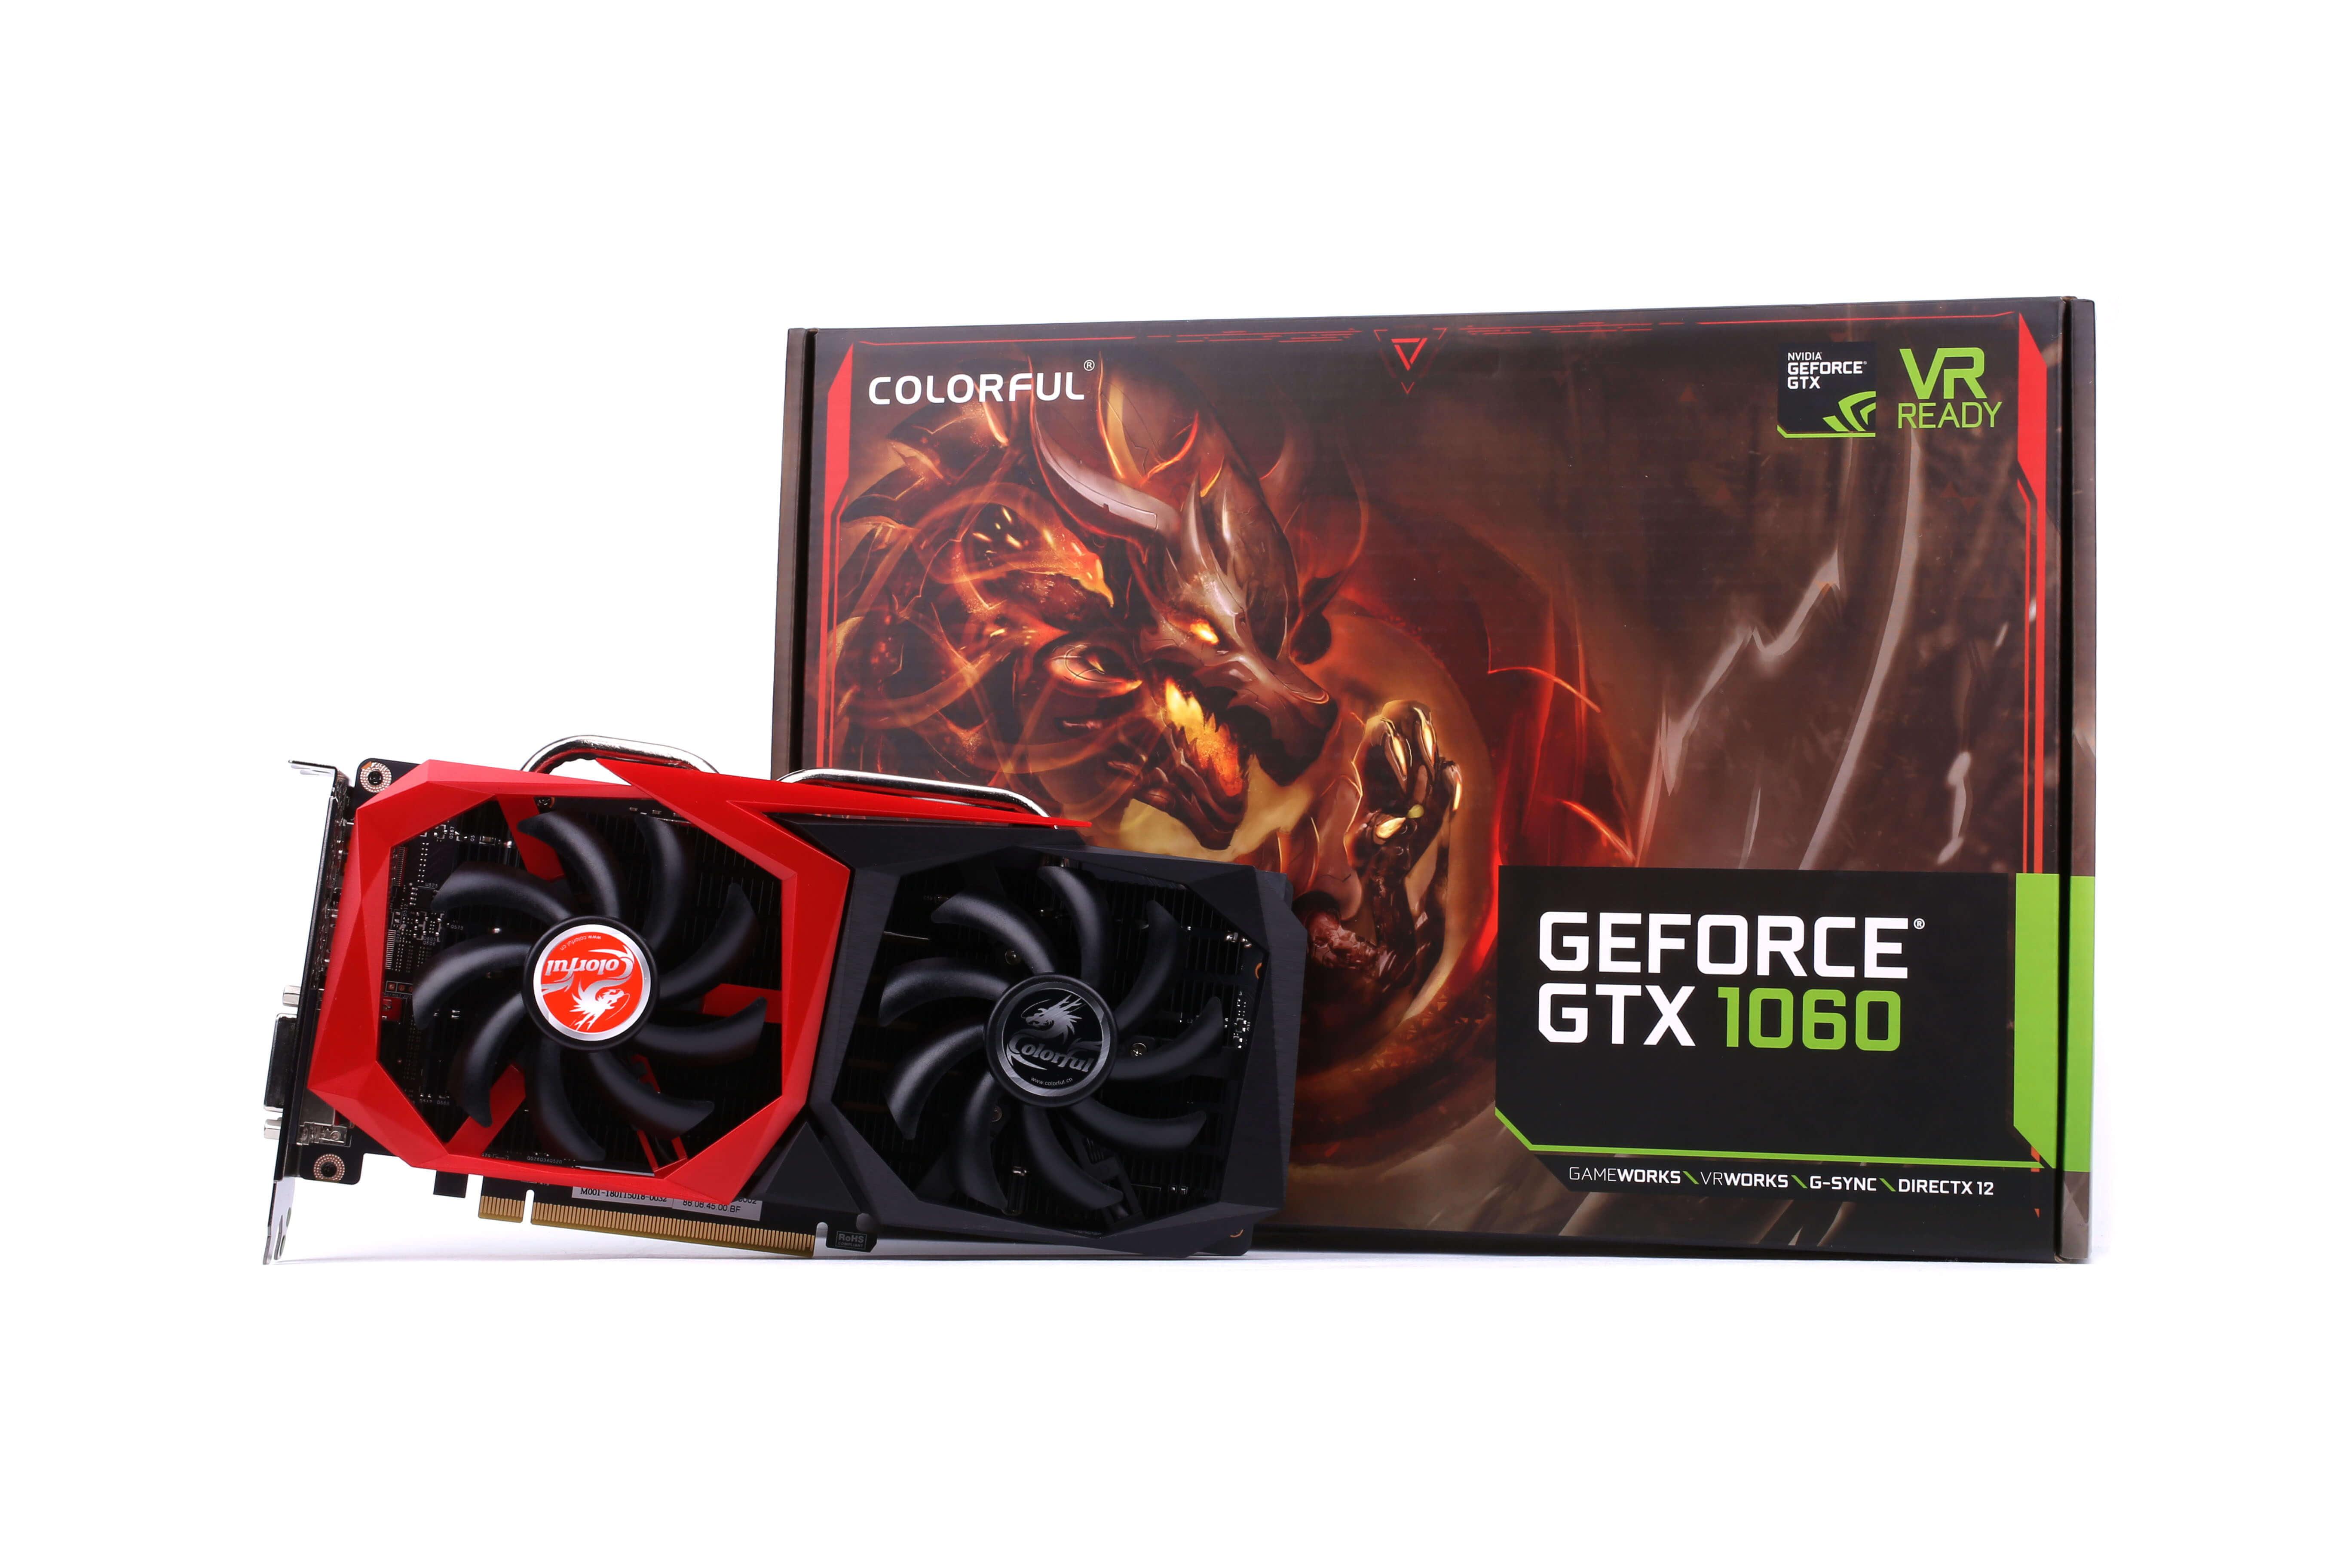 Colorful GeForce GTX 1060 NB 6GB GDDR5 Graphics Card